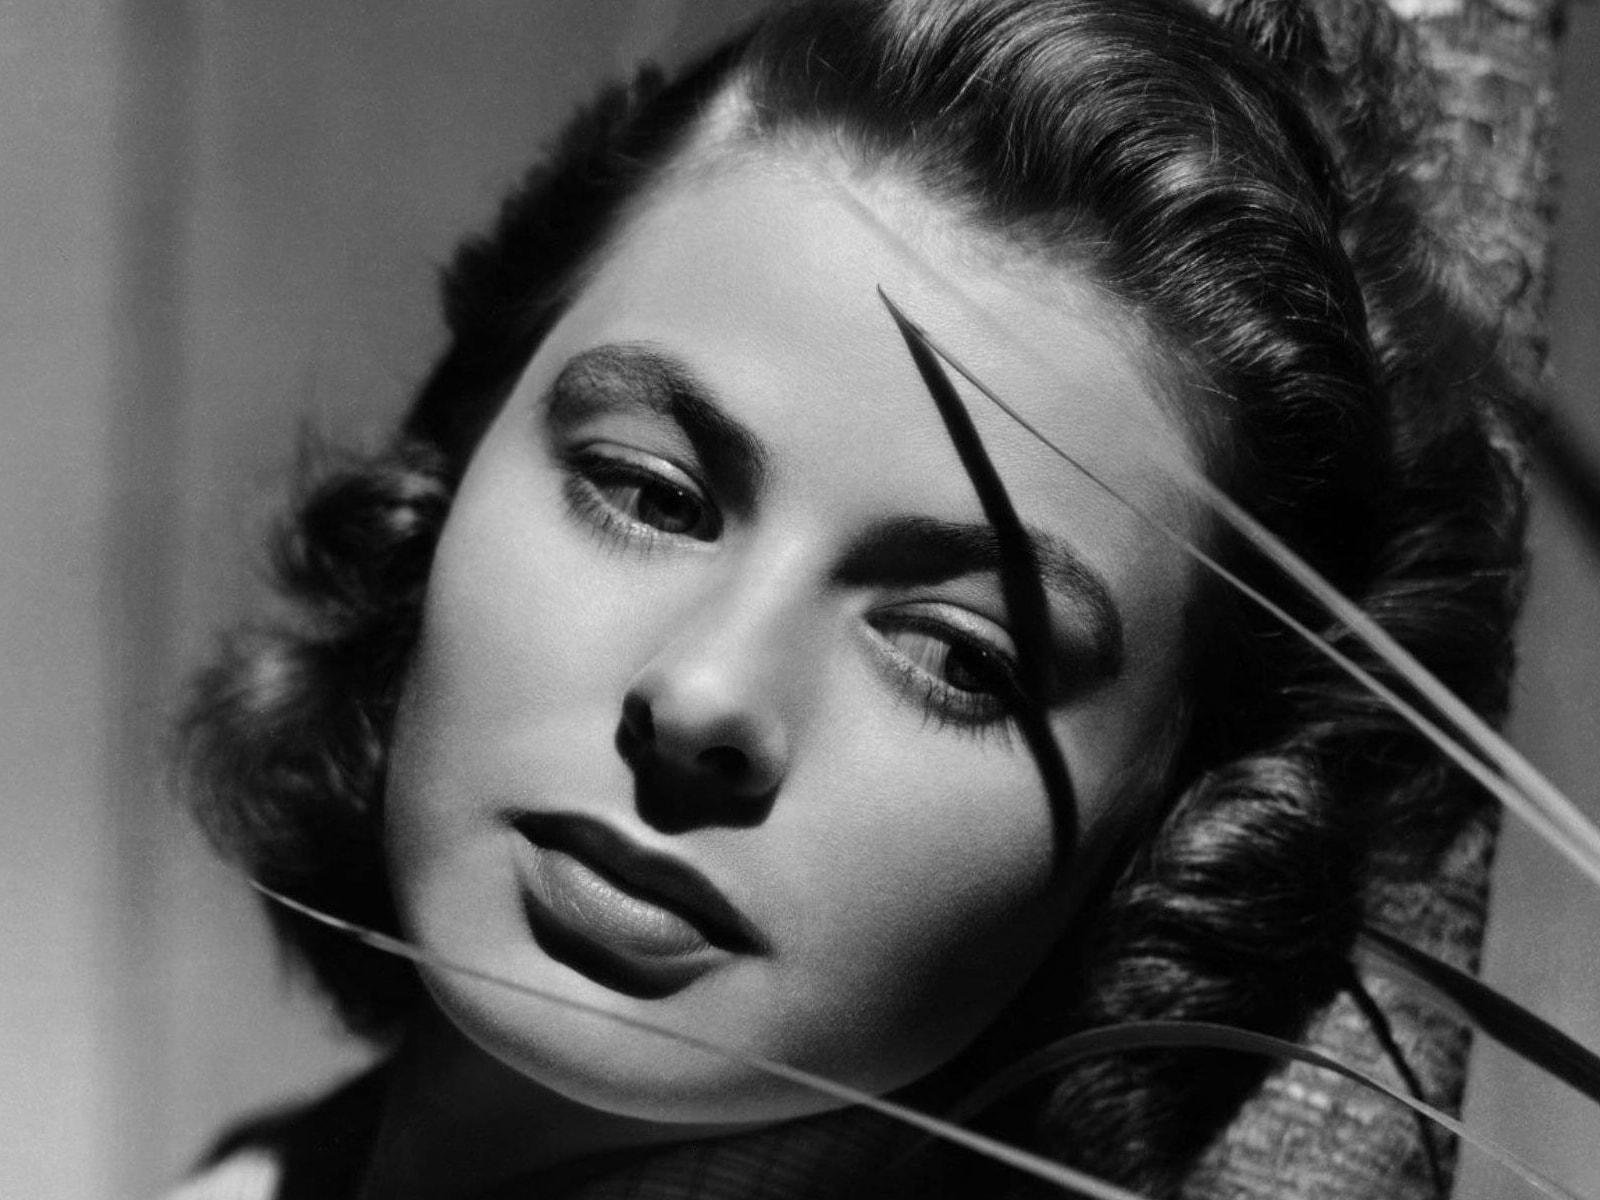 Ingrid Bergman Wallpapers hd